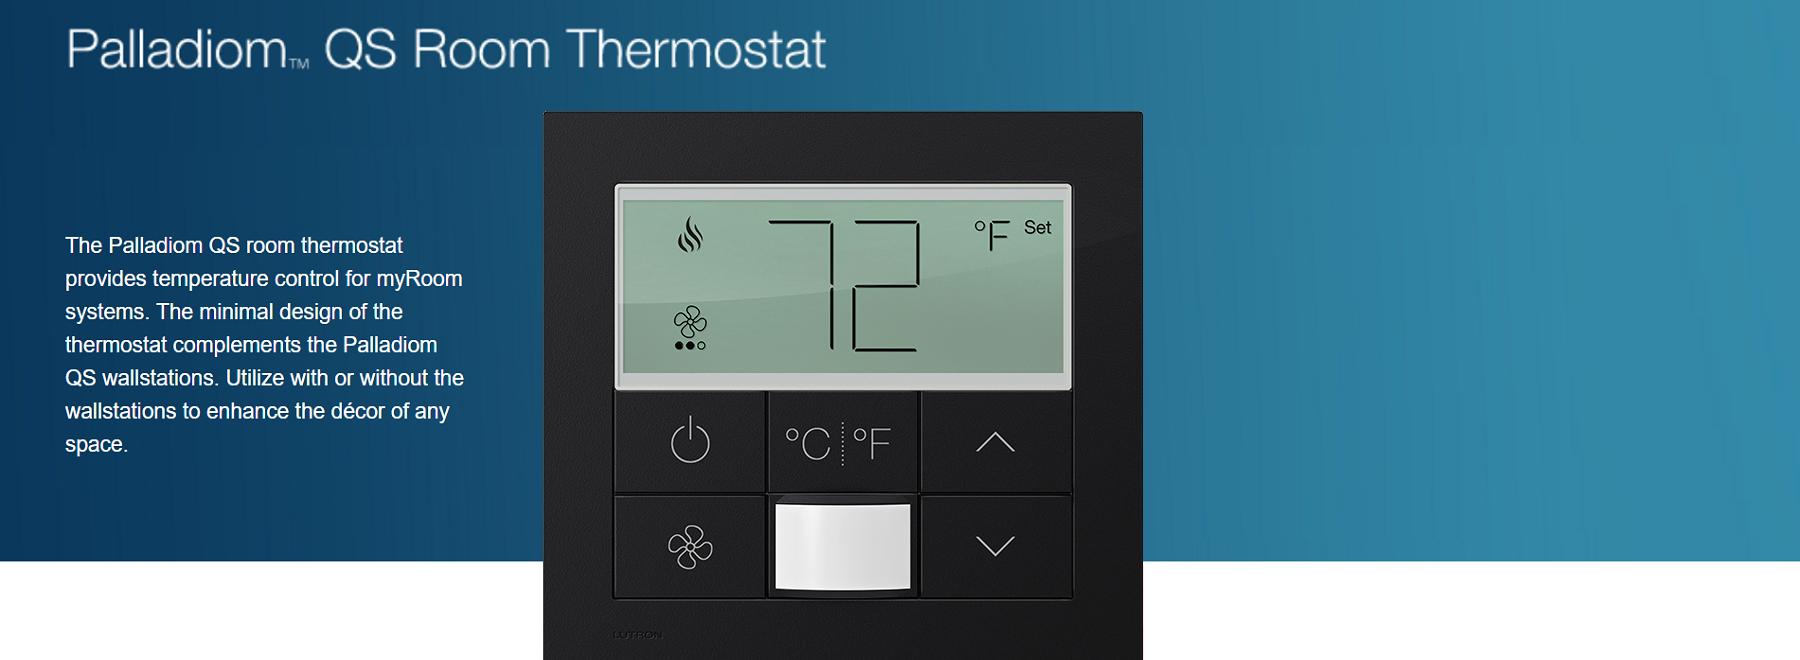 Palladiom Thermostat